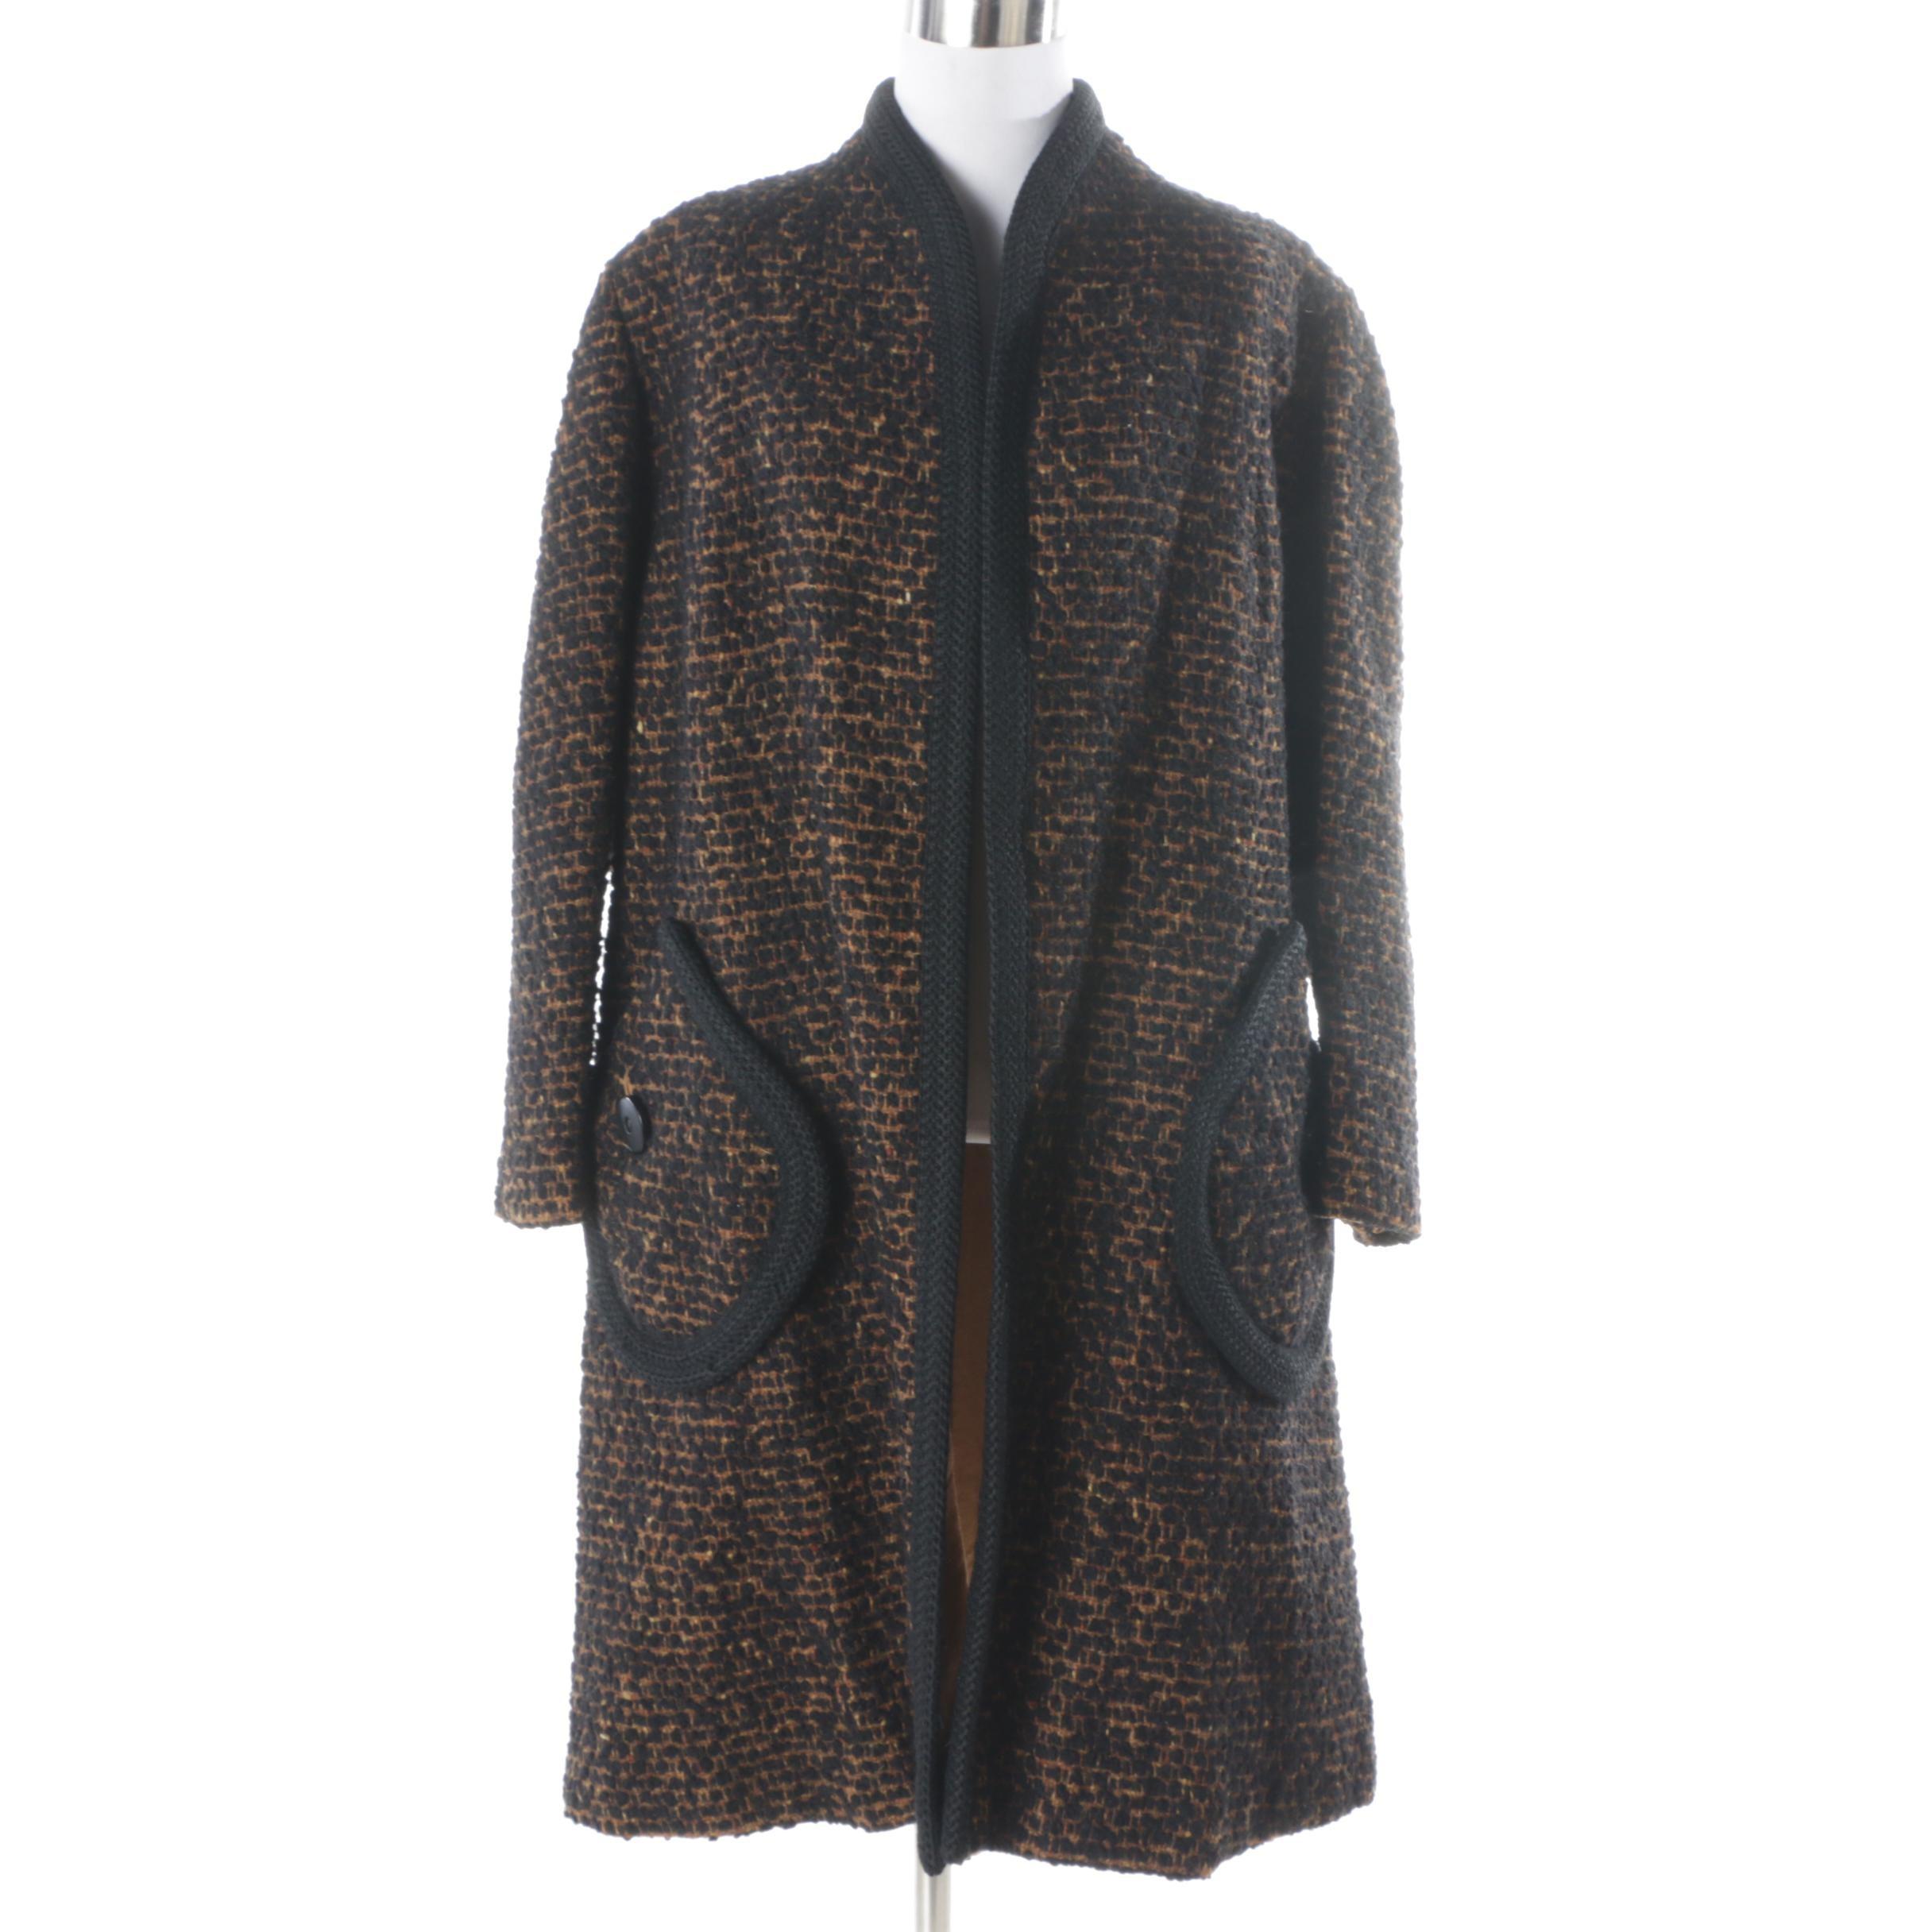 Women's Vintage Wool Blend Coat